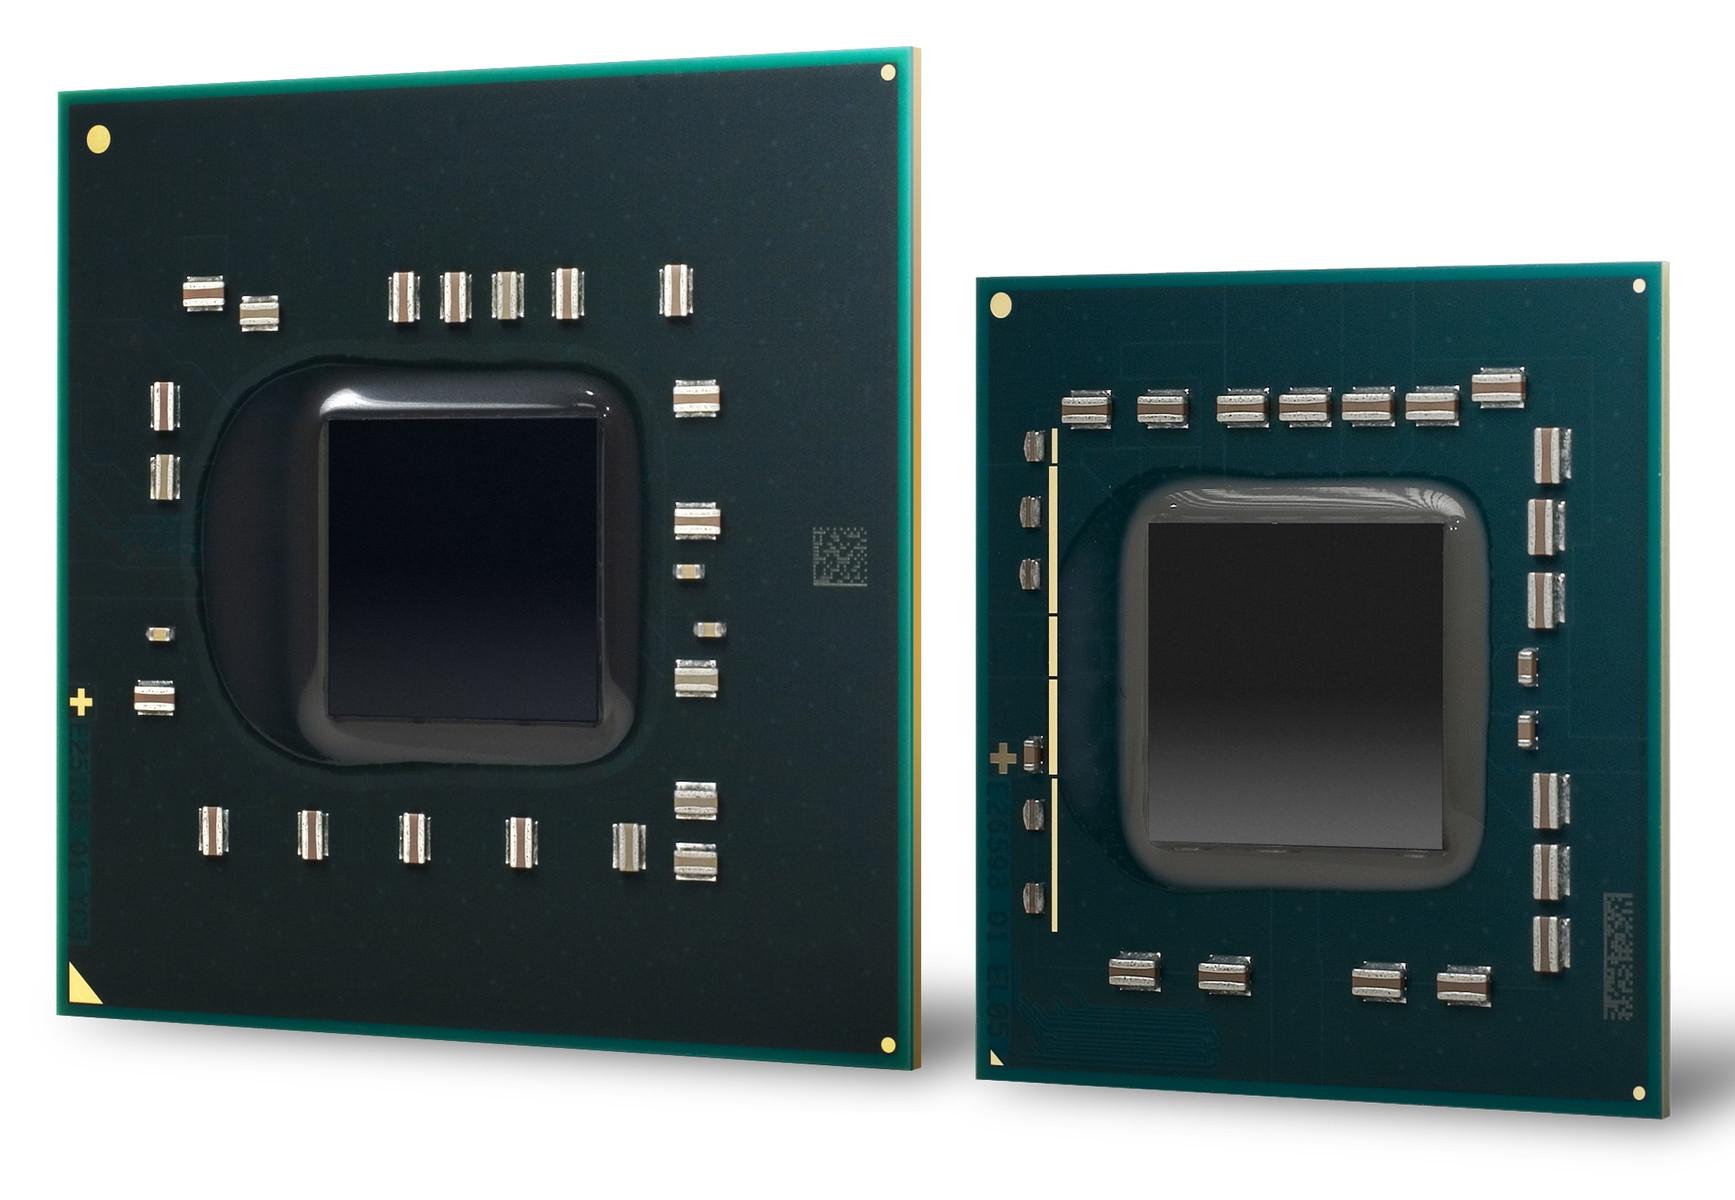 Intel gl40 graphics